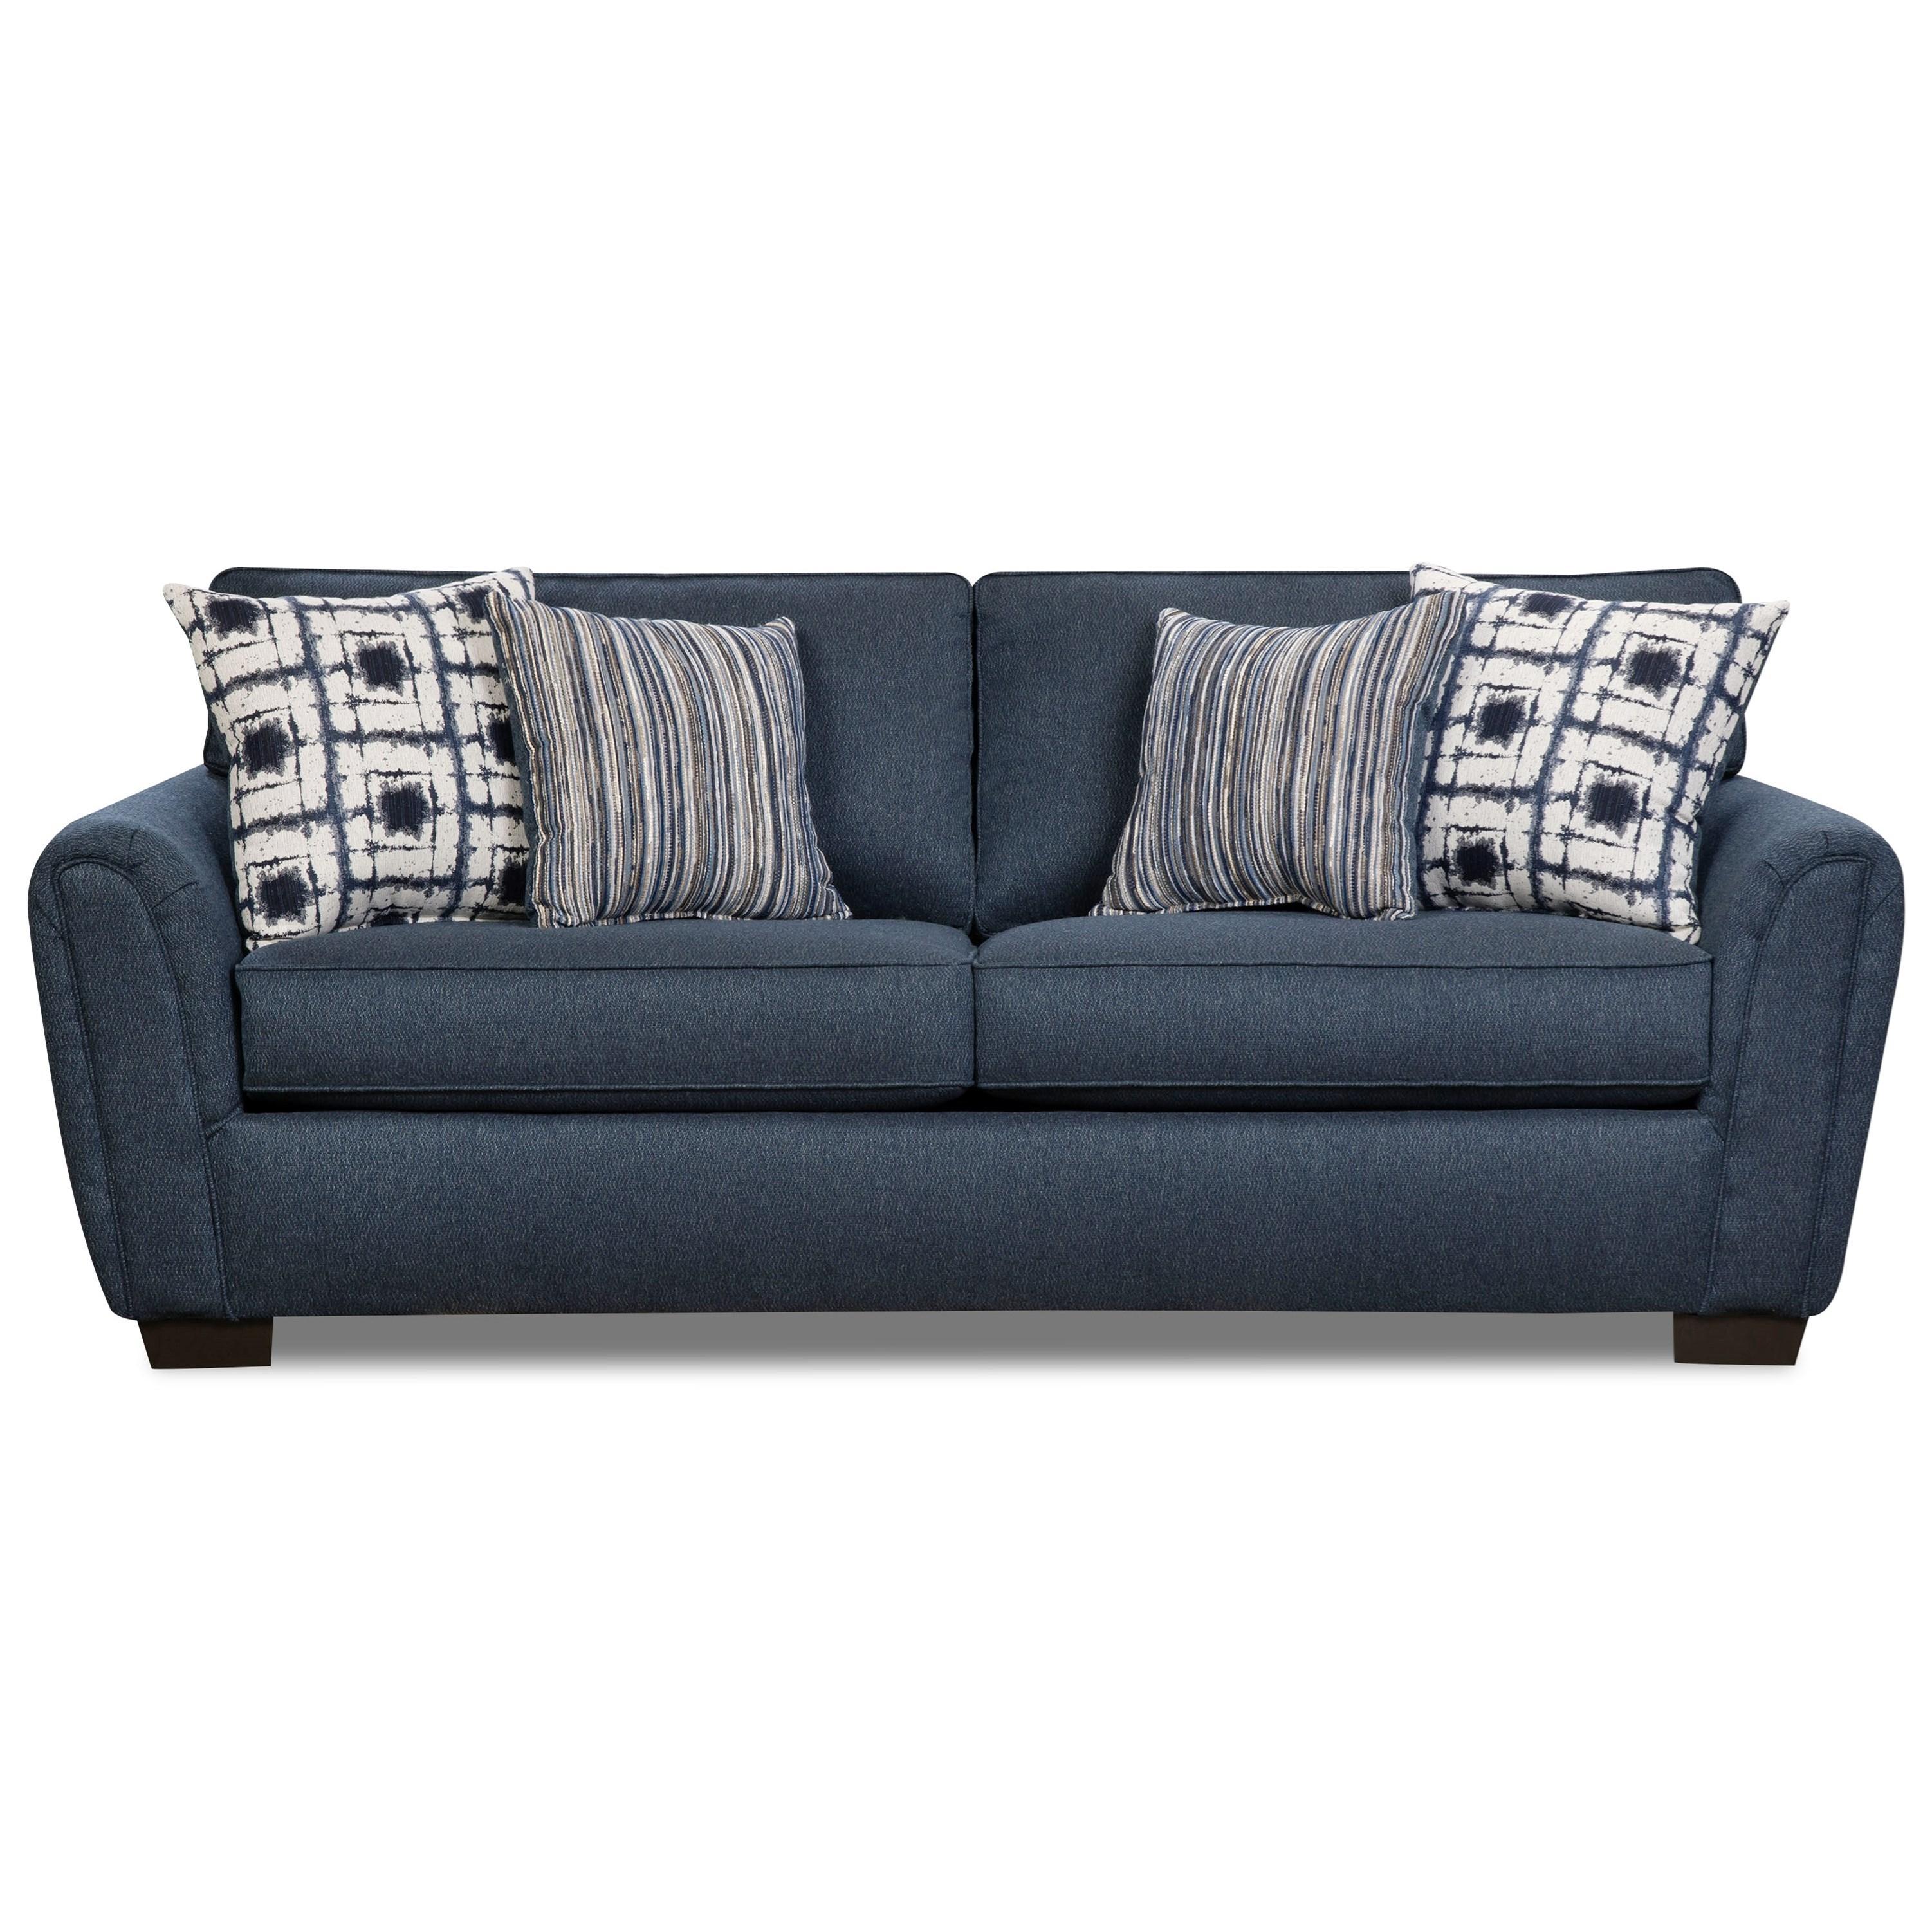 Corinthian 7380 Two Seat Sofa - Item Number: 7383-Rapids-Navy